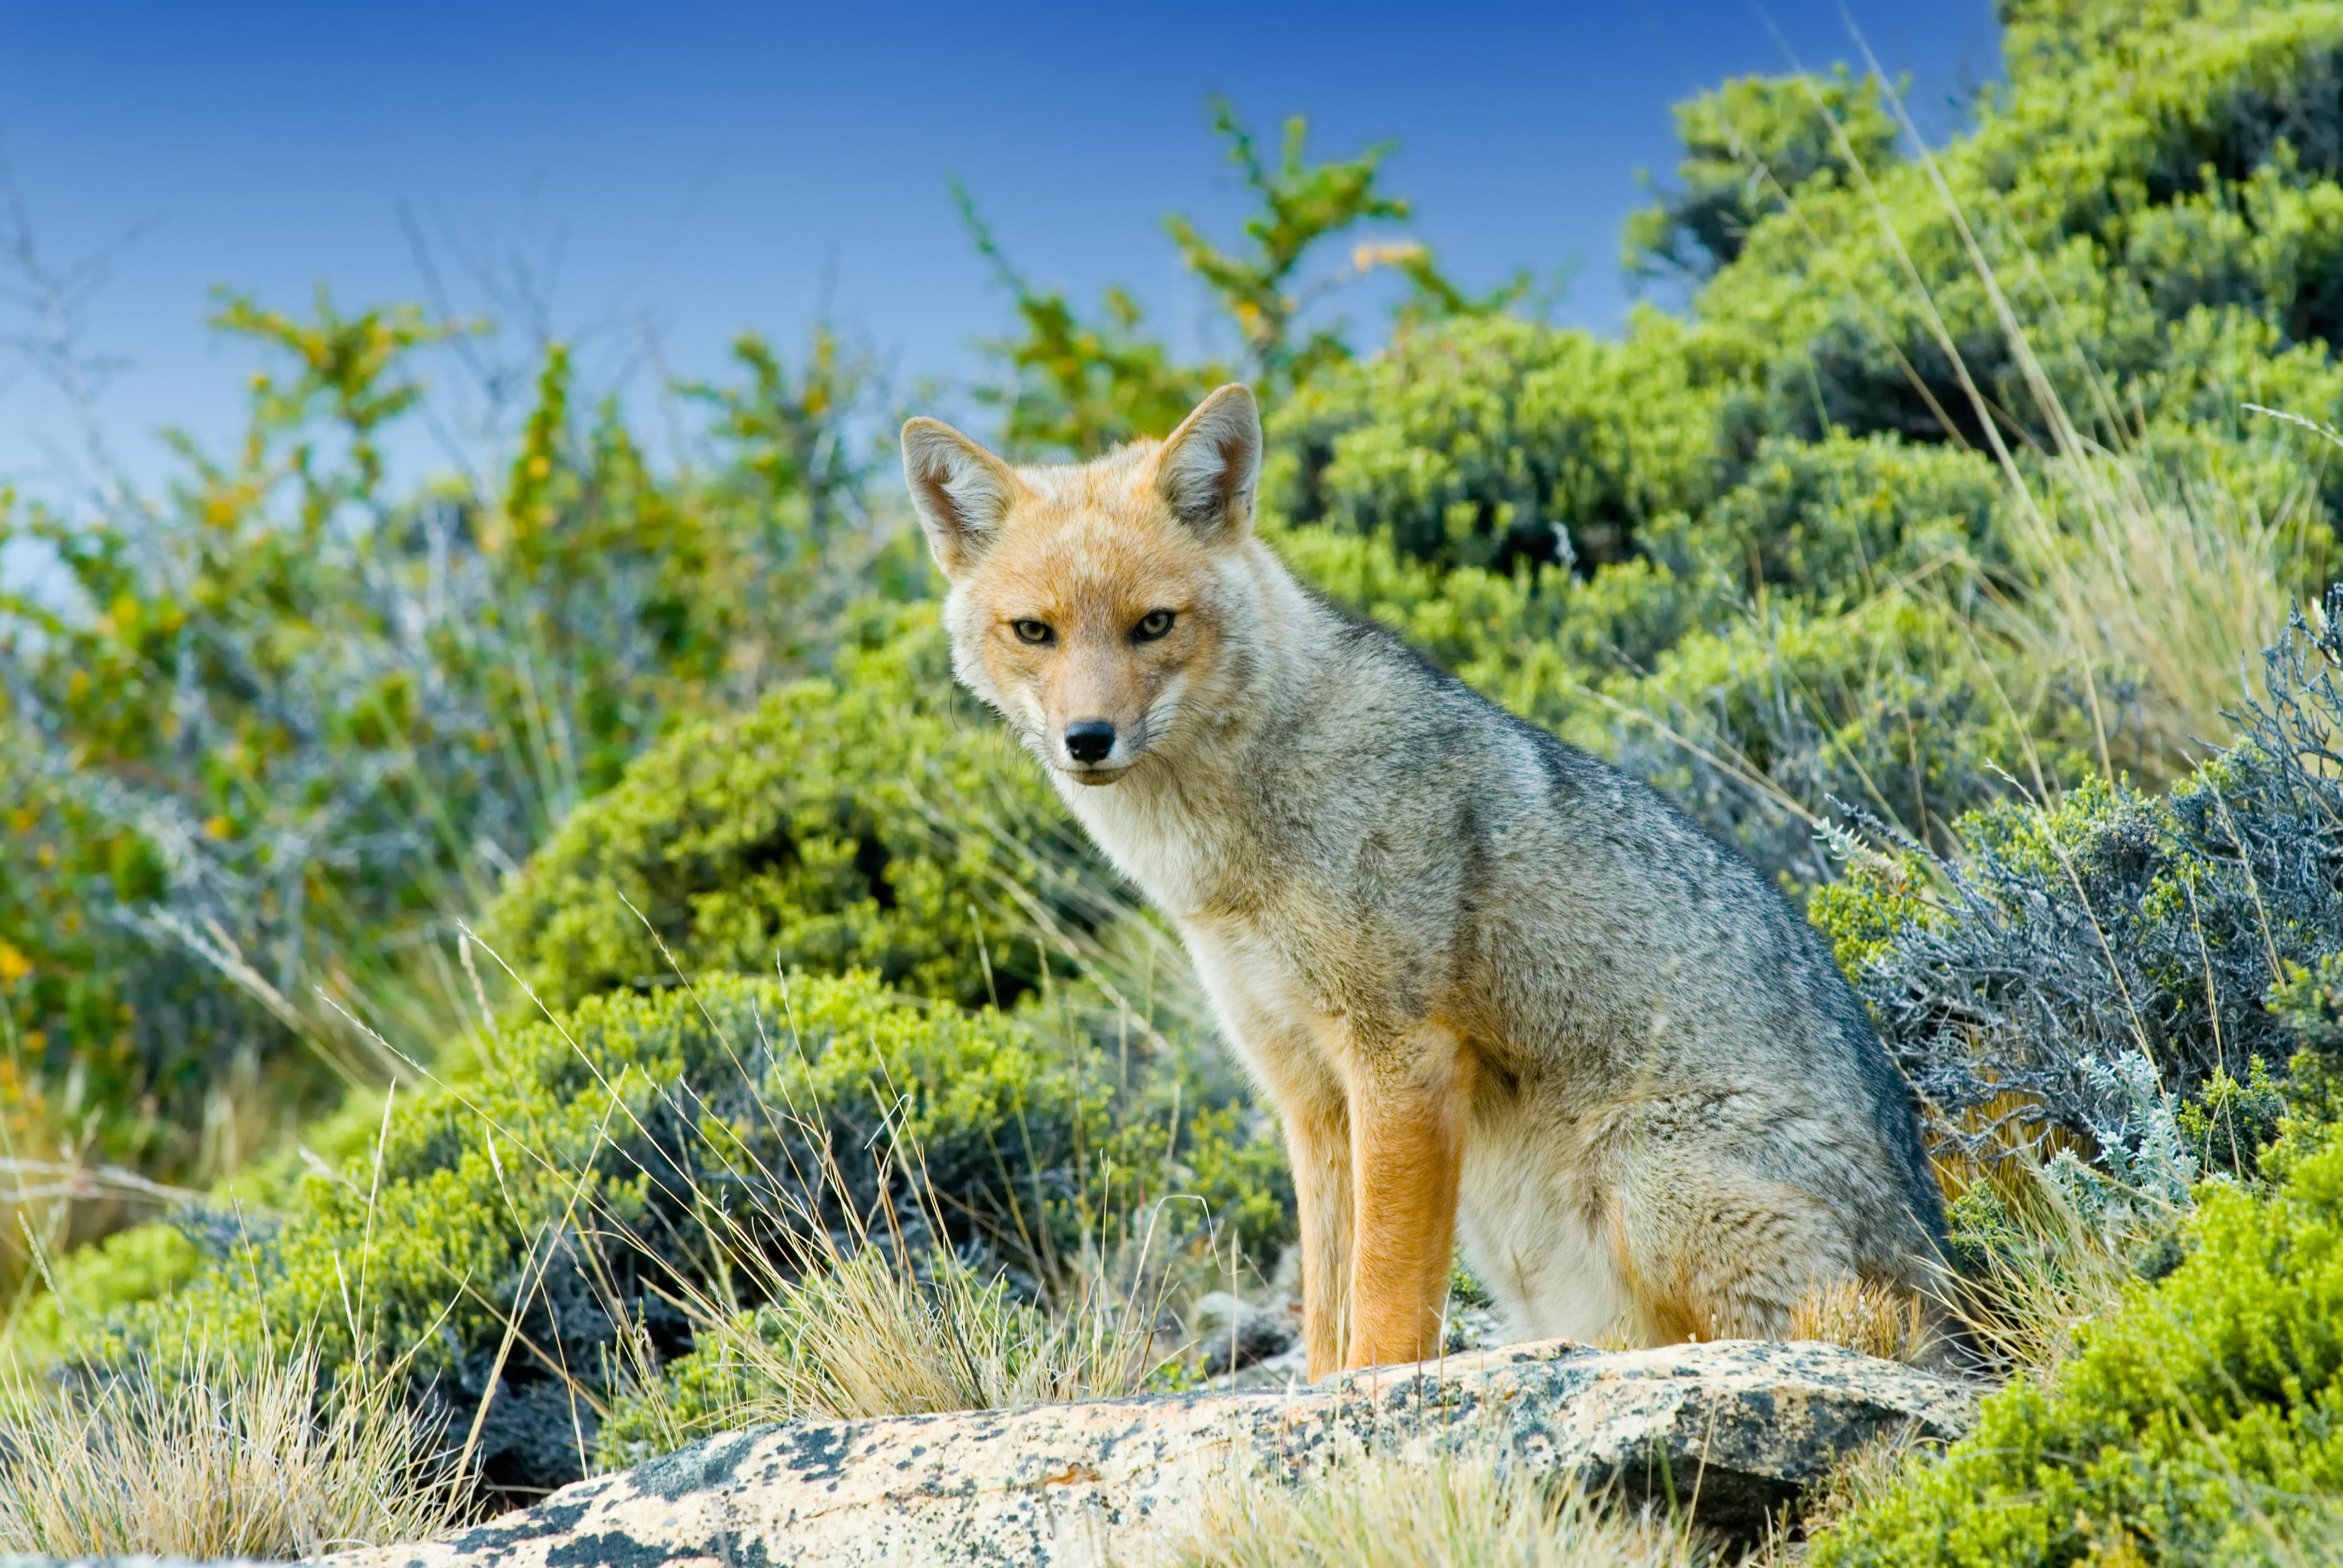 Patagonian fox sitting on grass in patagonia